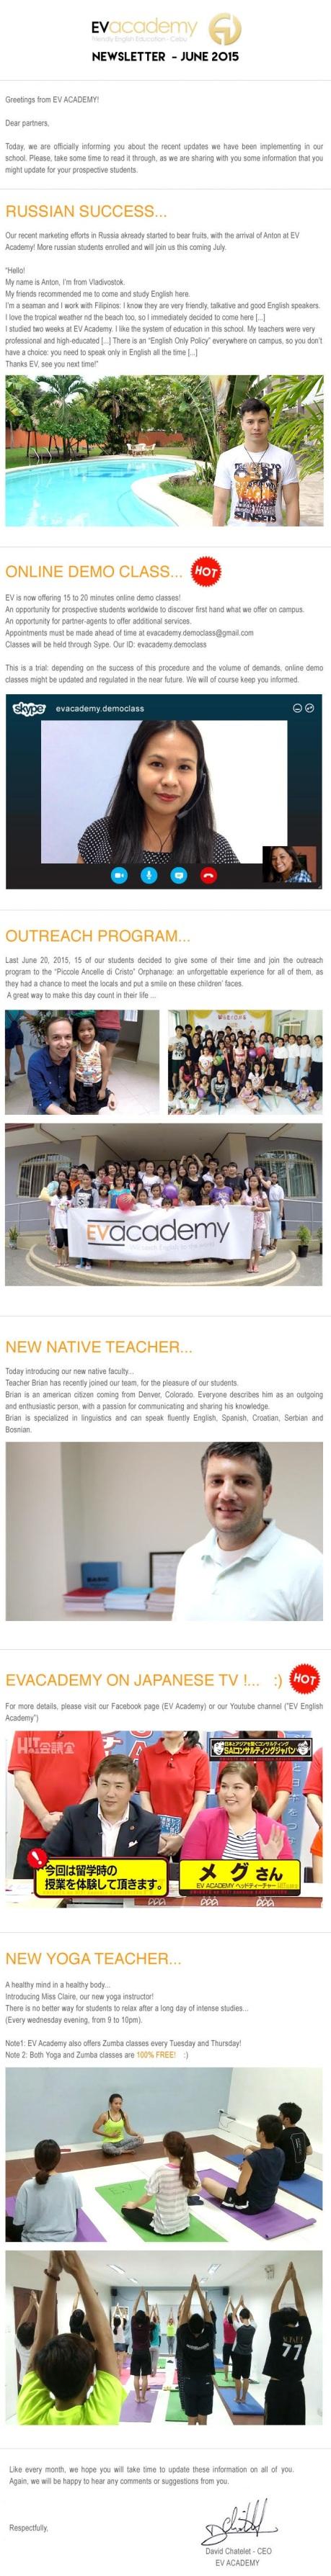 EV Cebu Newsletter thang 6